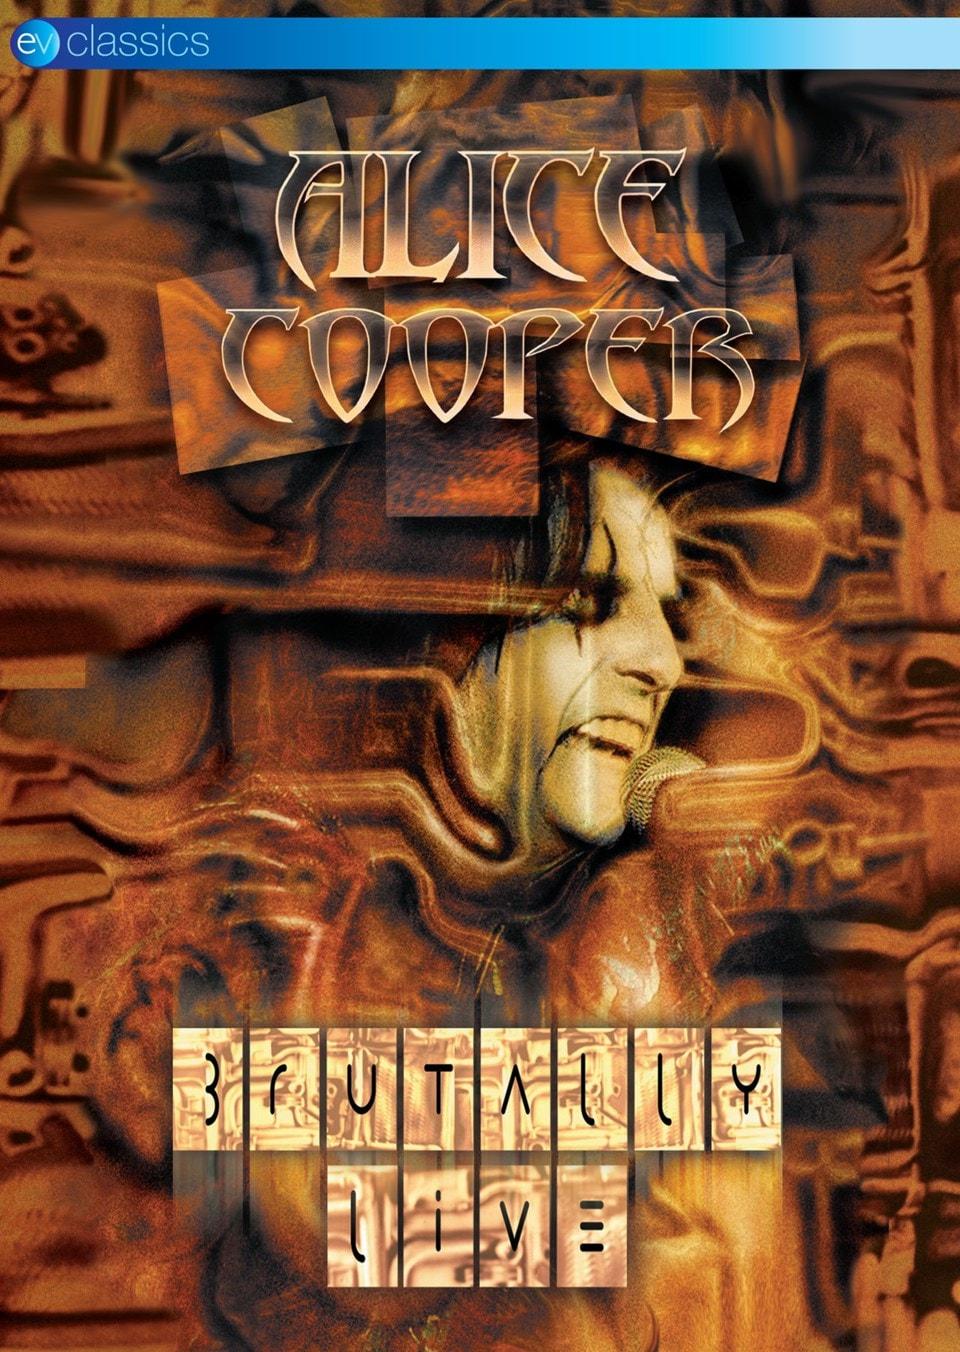 Alice Cooper: Brutally Live - 1